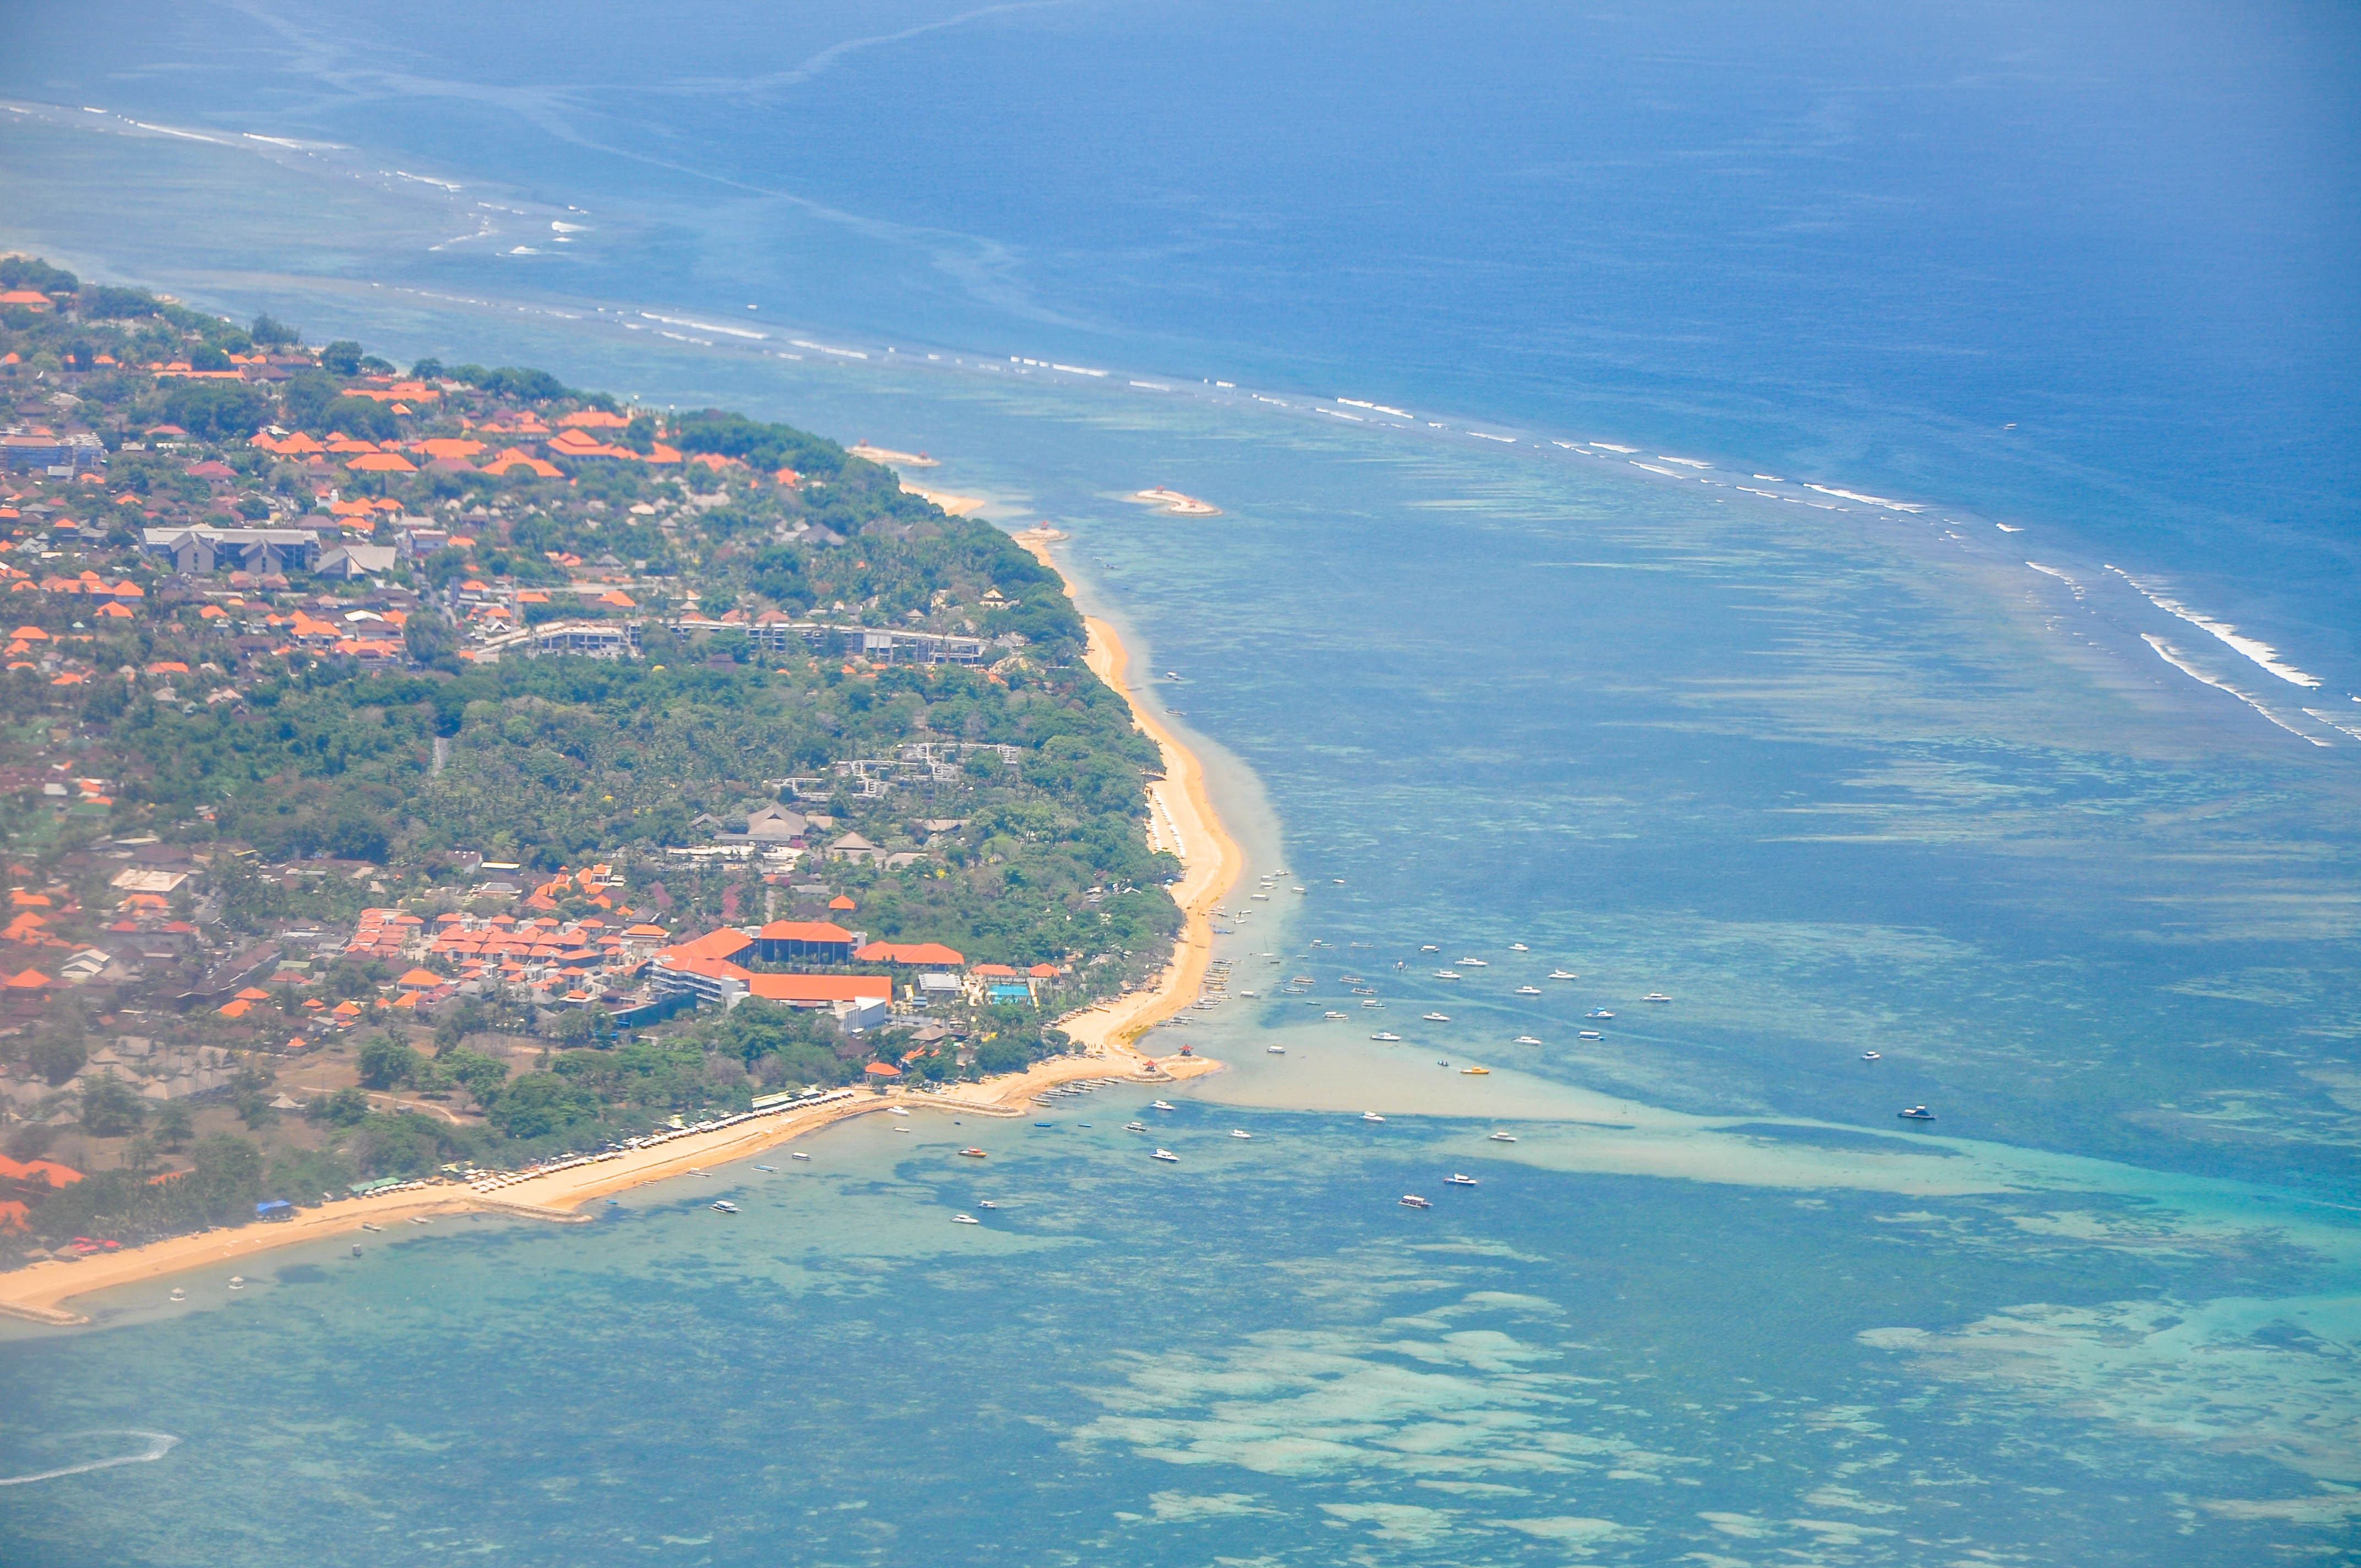 Bali beaches (16703033410).jpg